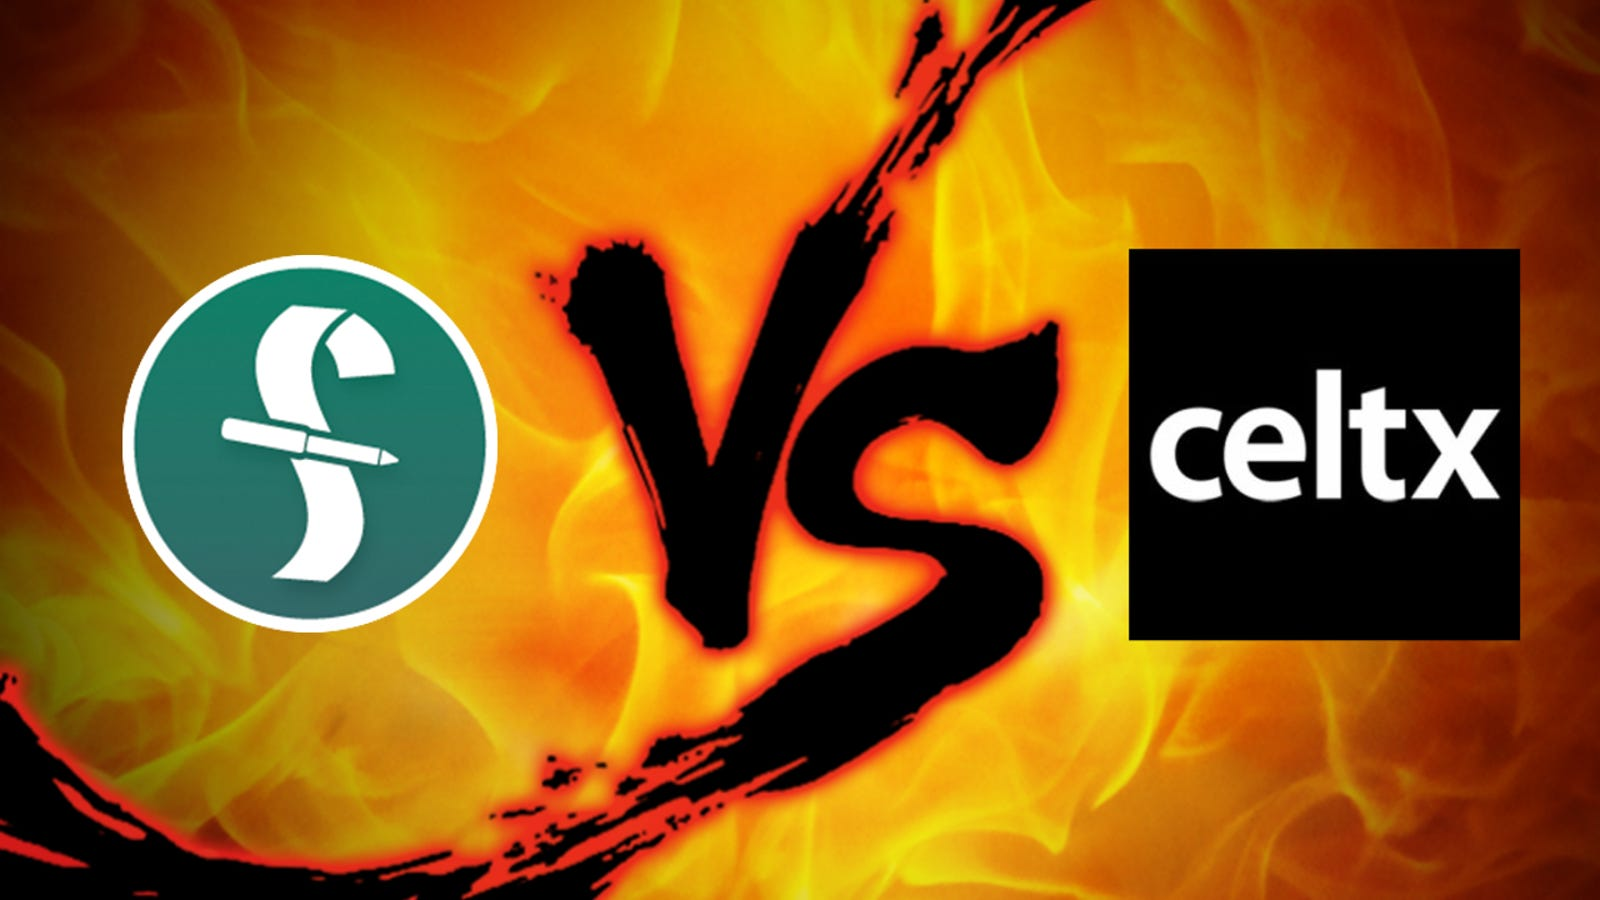 Screenwriting Software Showdown: Final Draft vs  Celtx